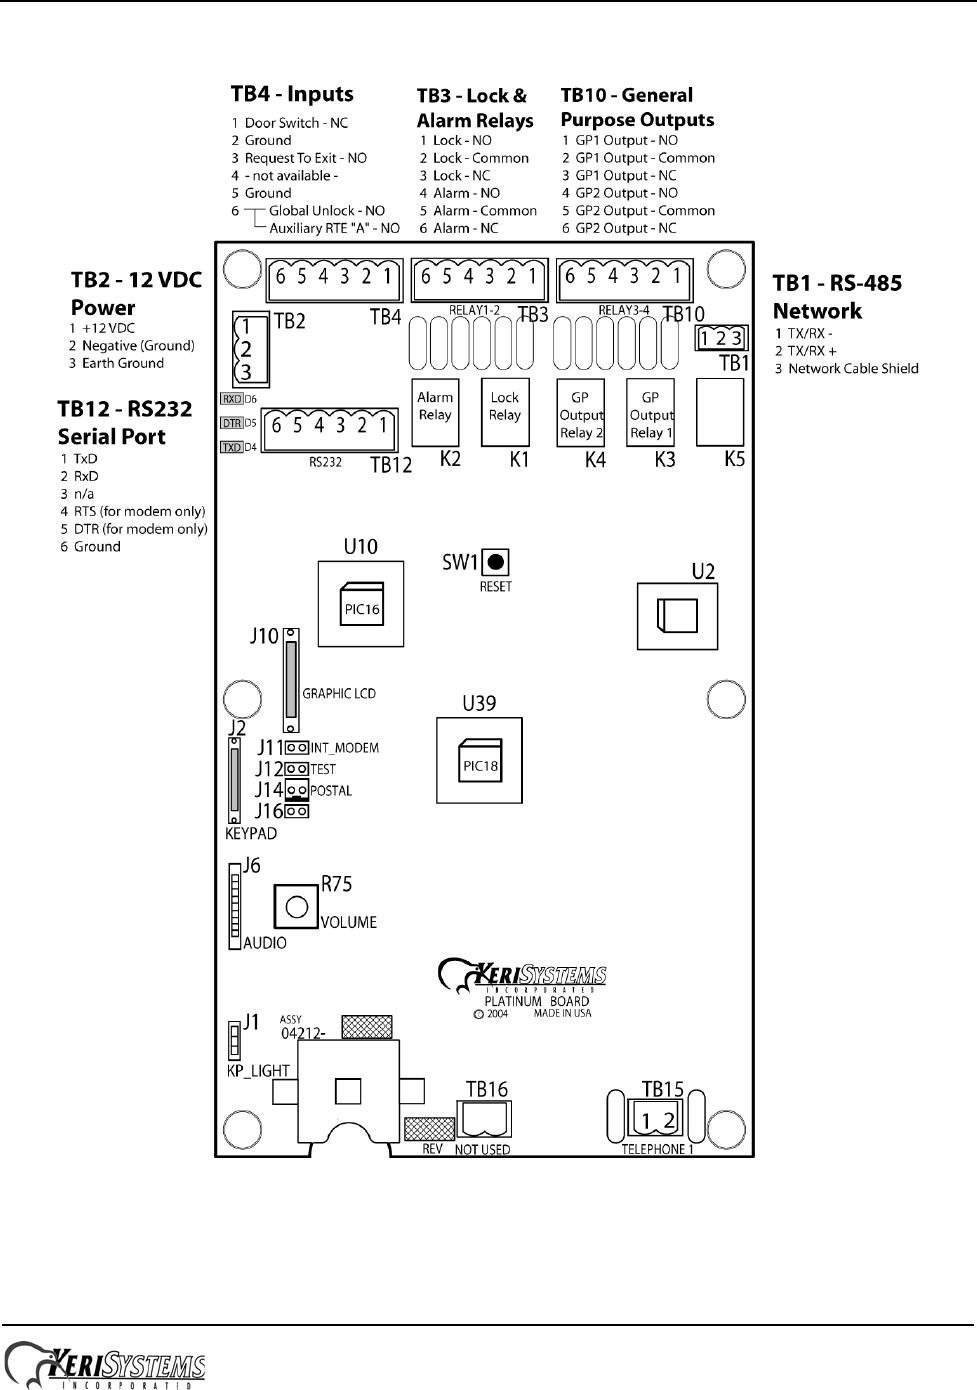 [DIAGRAM_09CH]  Keri Systems EntraGuard_Platinum_Quick_Start_Guide Entra Guard Platinum  Telephone Entry Controller Quick Start Guide Entraguard | Keri Access Wiring Diagram |  | UserManual.wiki